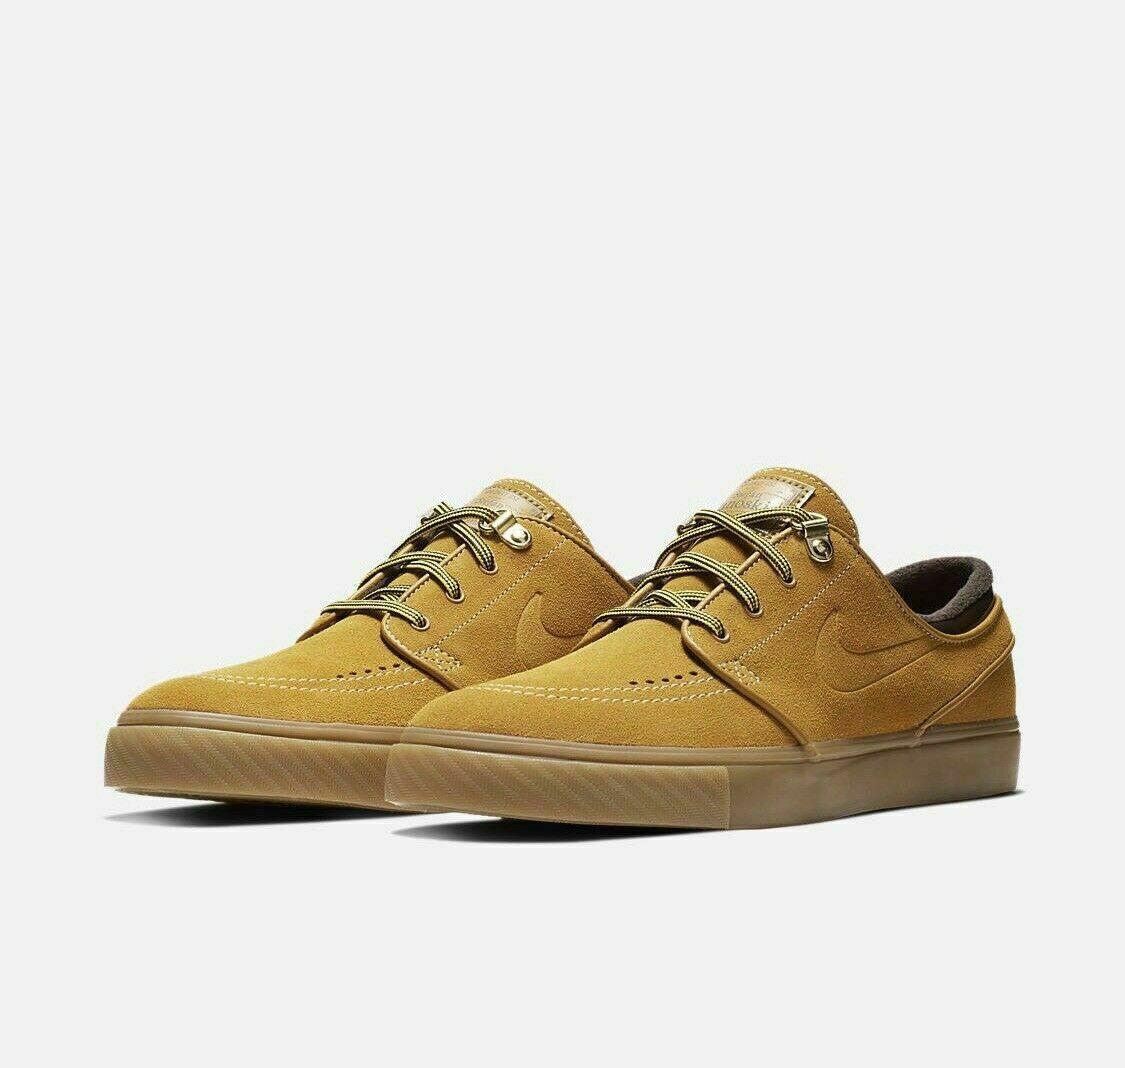 Nike SB Zoom Stefan Stefan Stefan Janoski Storlek 9 Premium Bronze Gum ljus bspringaaa AR1575 779  billigt försäljning online